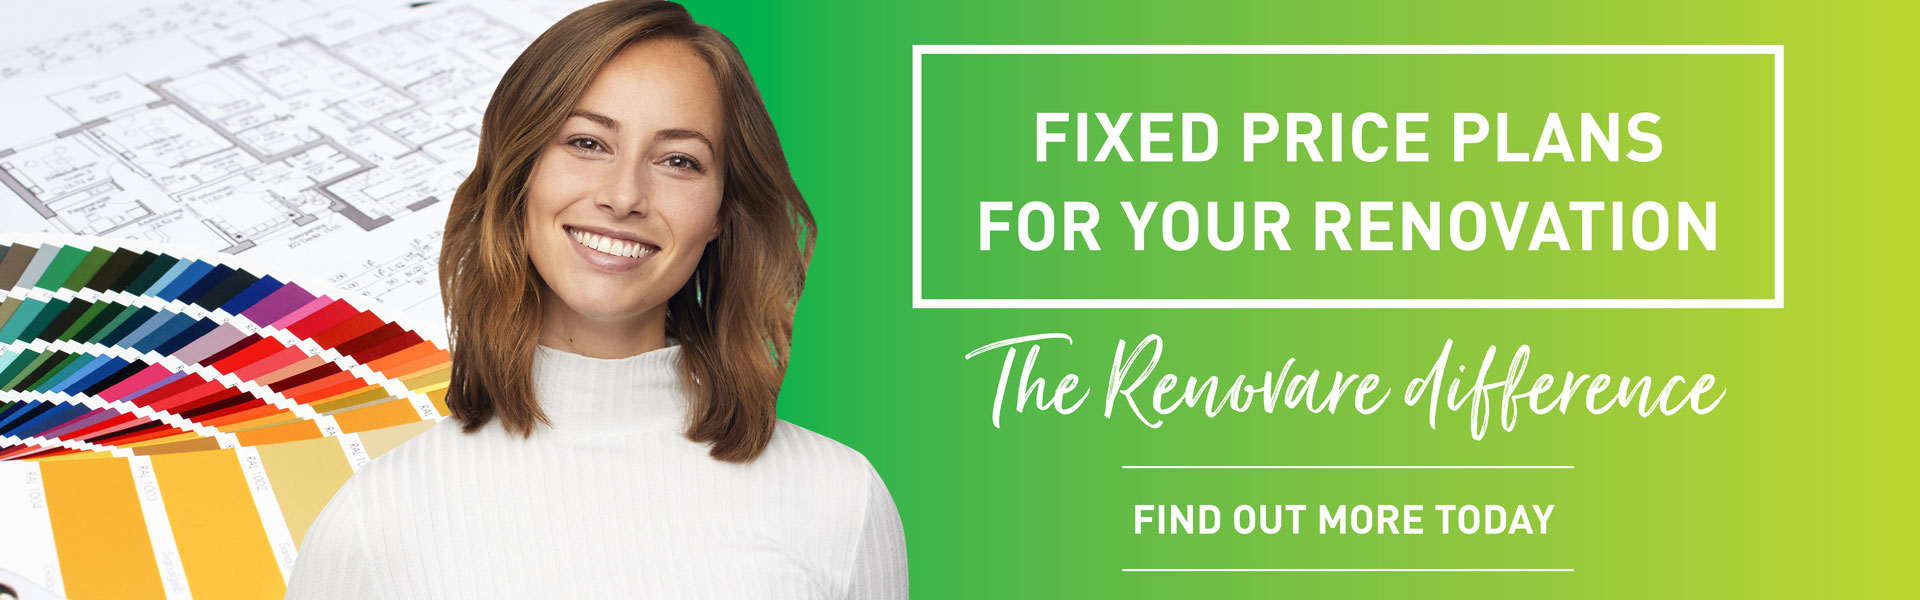 05-Renovare-fixed-price-plans-development-feature